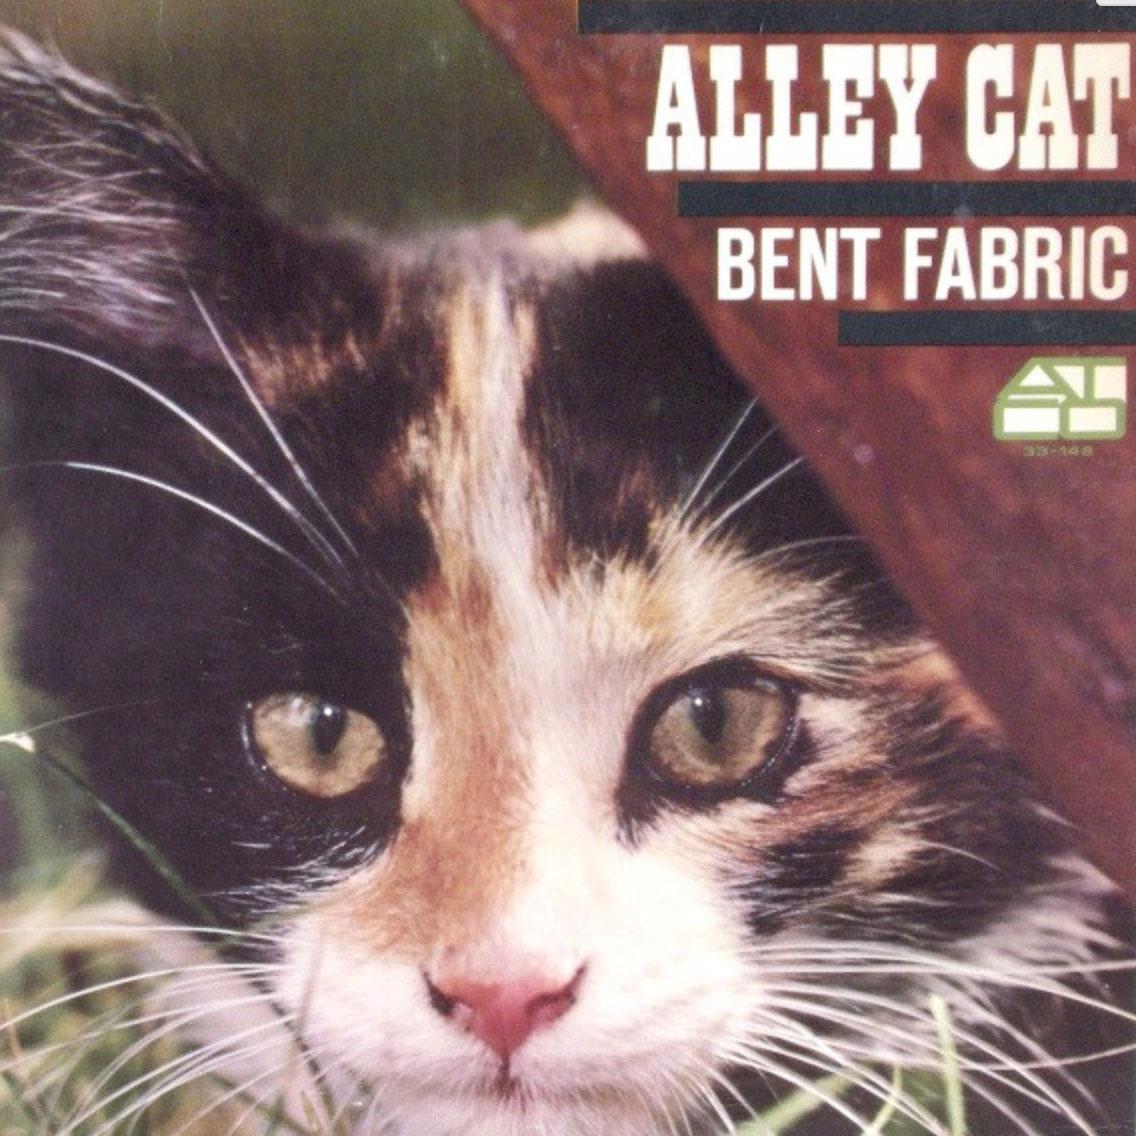 Alley-cat